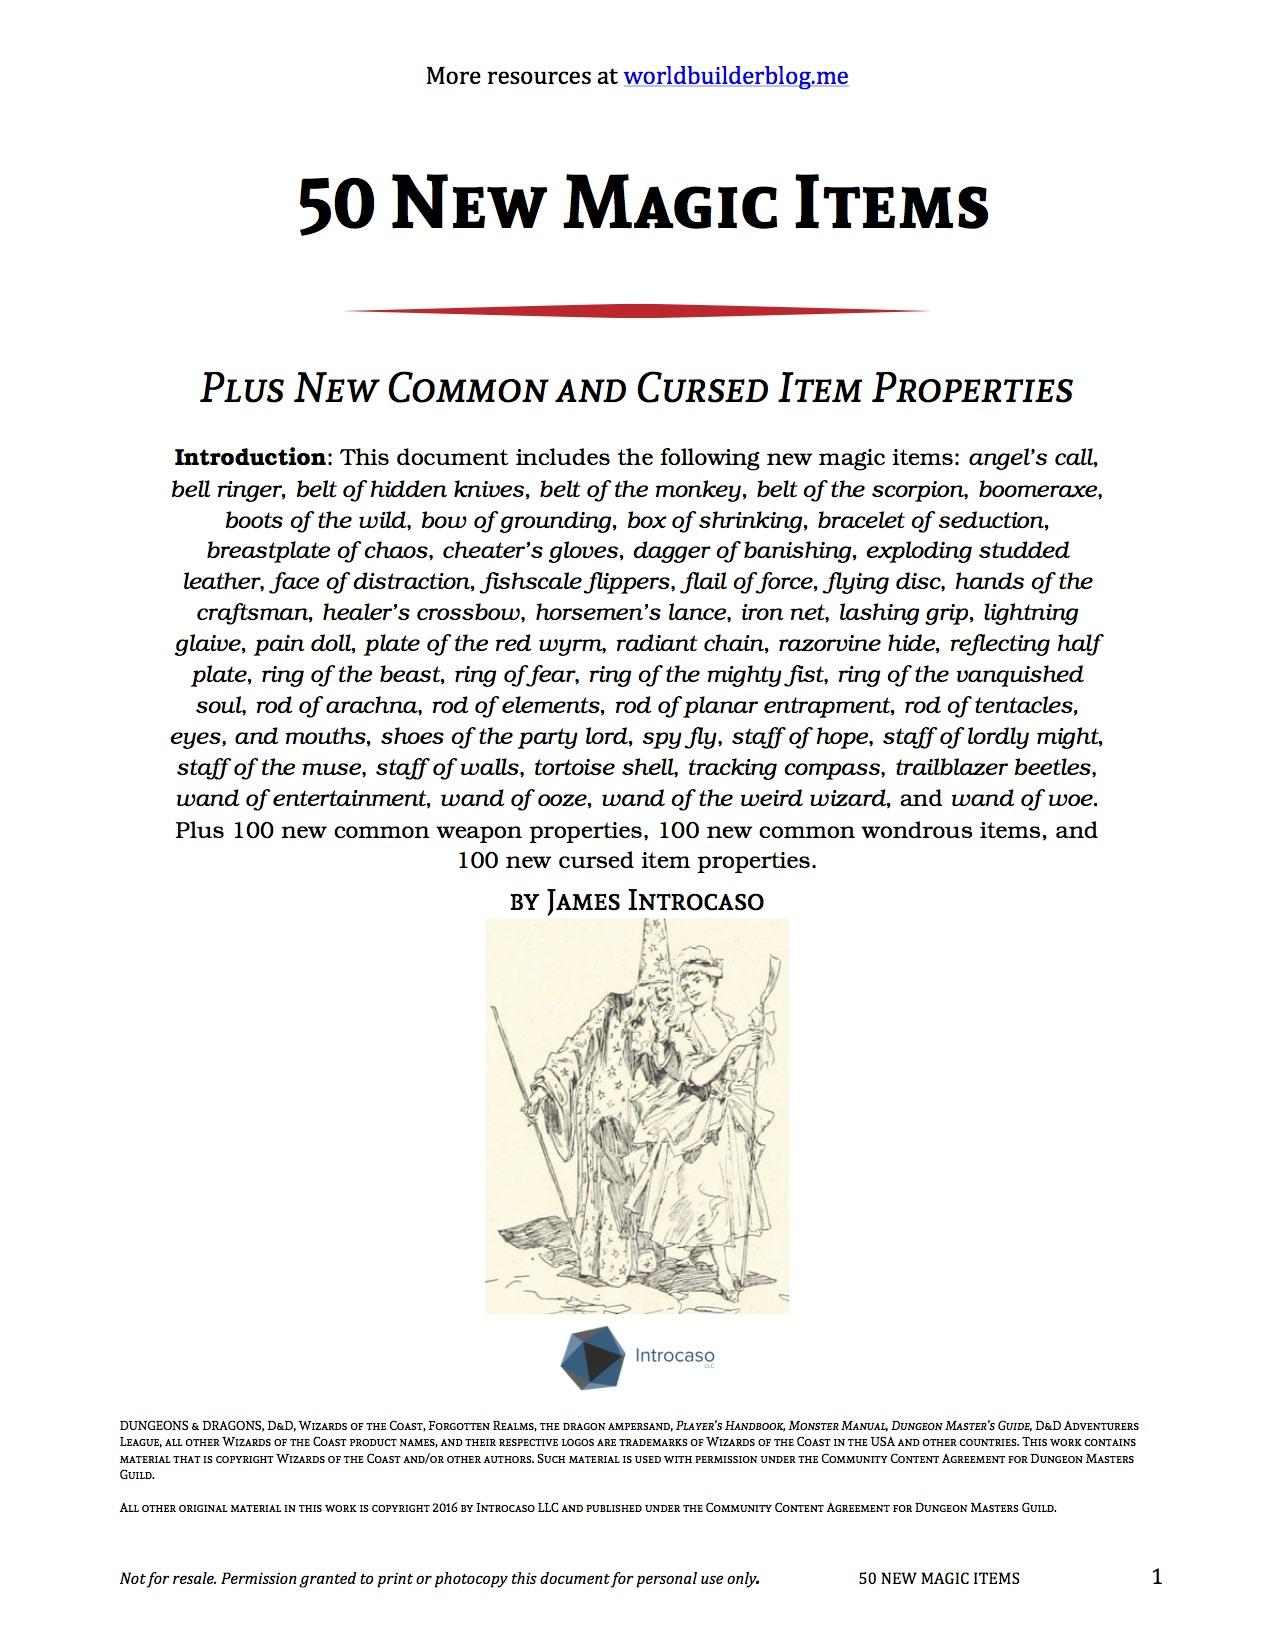 magic items | World Builder Blog